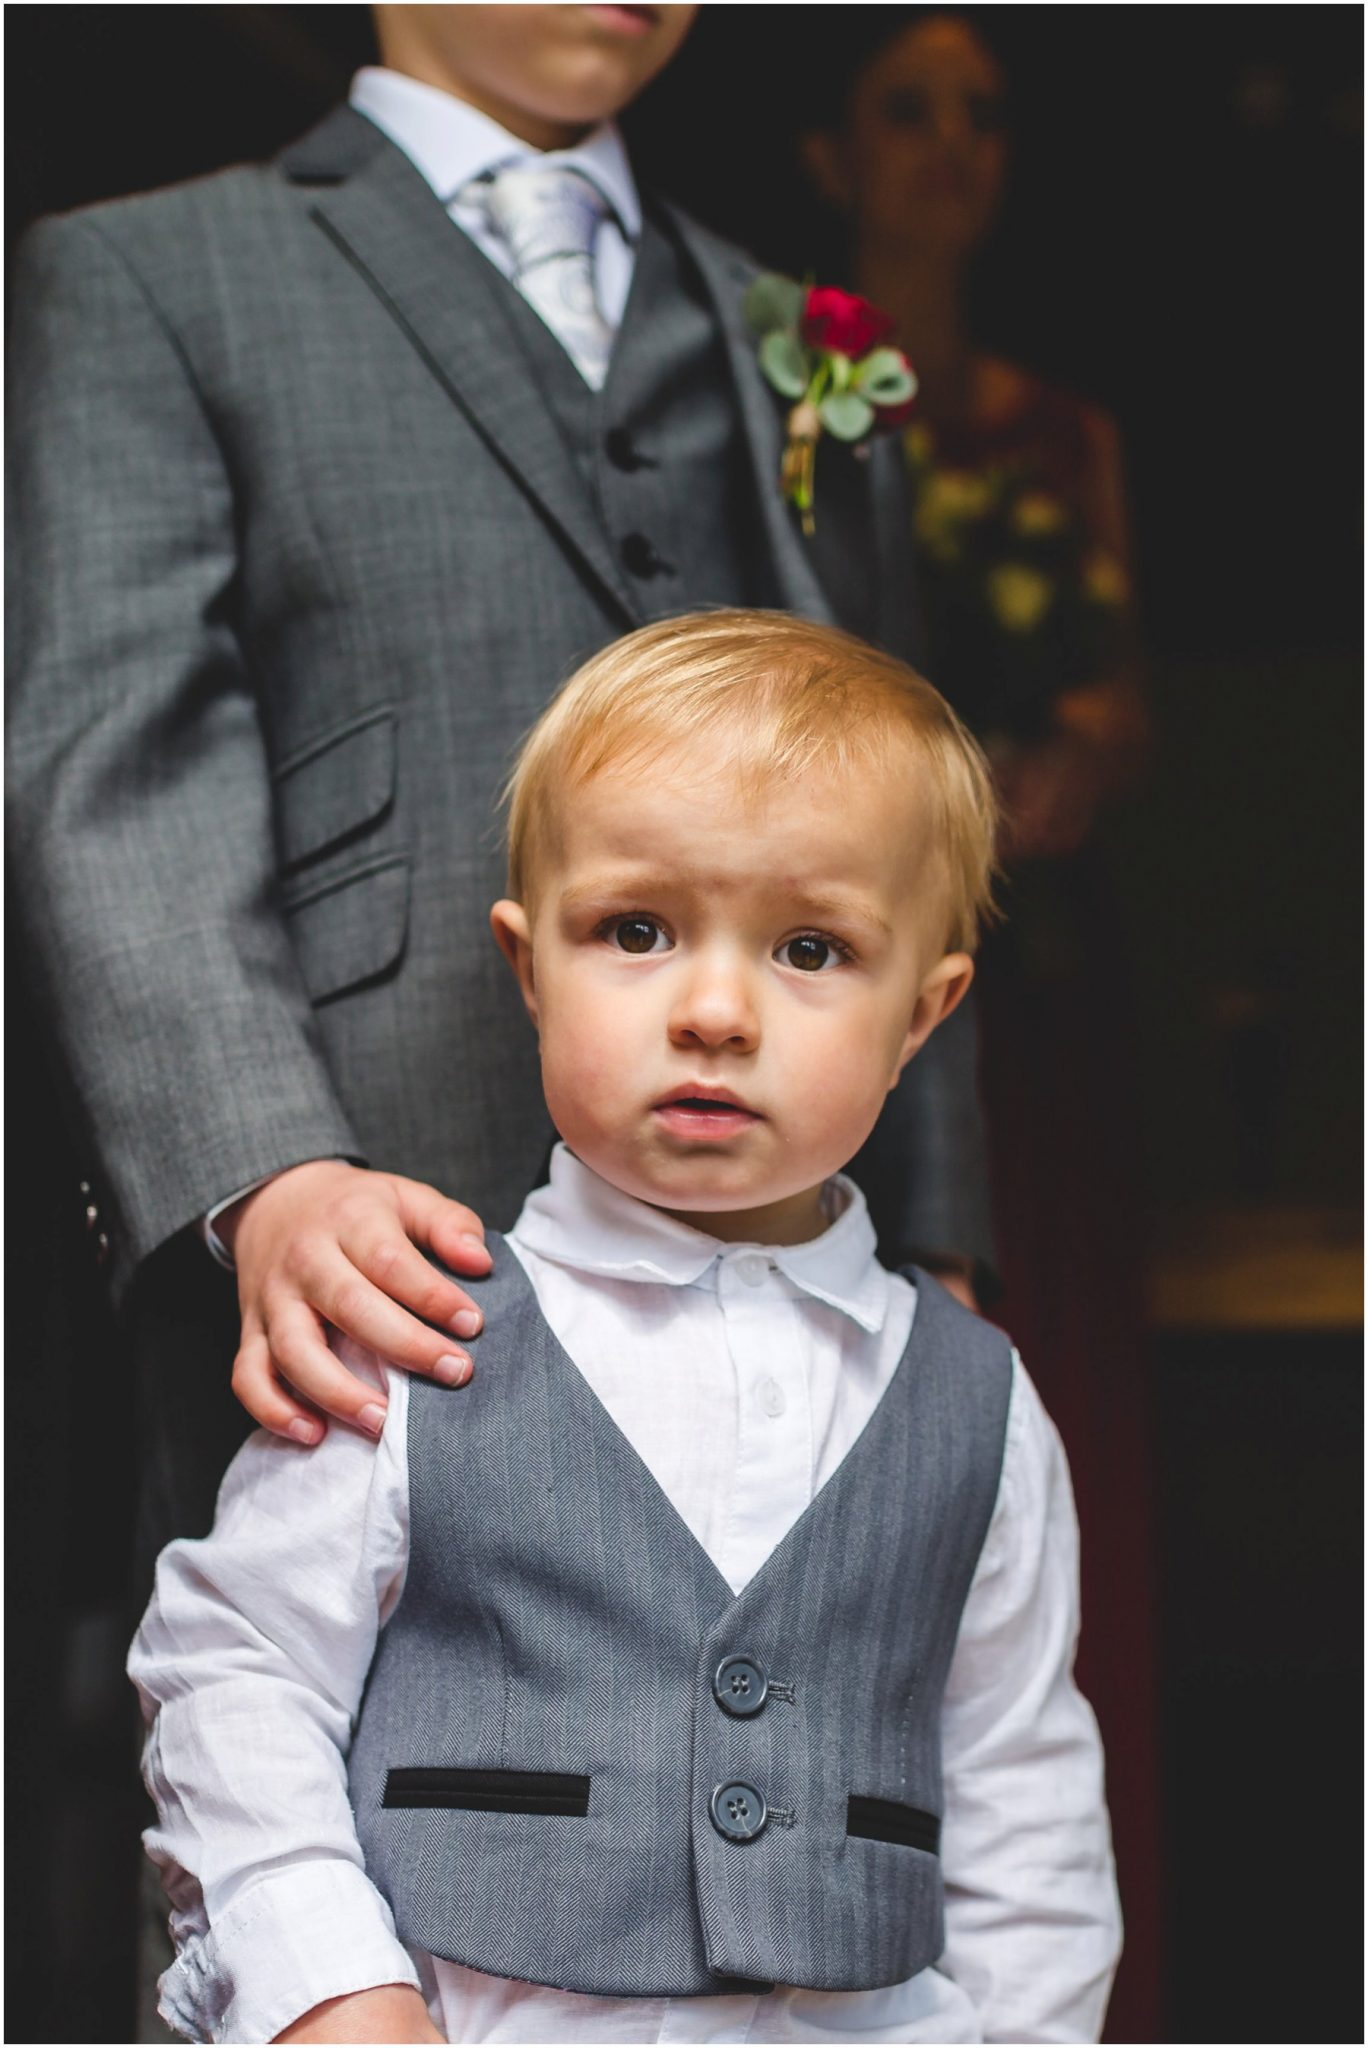 BRASTED'S WEDDING - JENNY AND JONNY - NORWICH WEDDING PHOTOGRAPHER 2